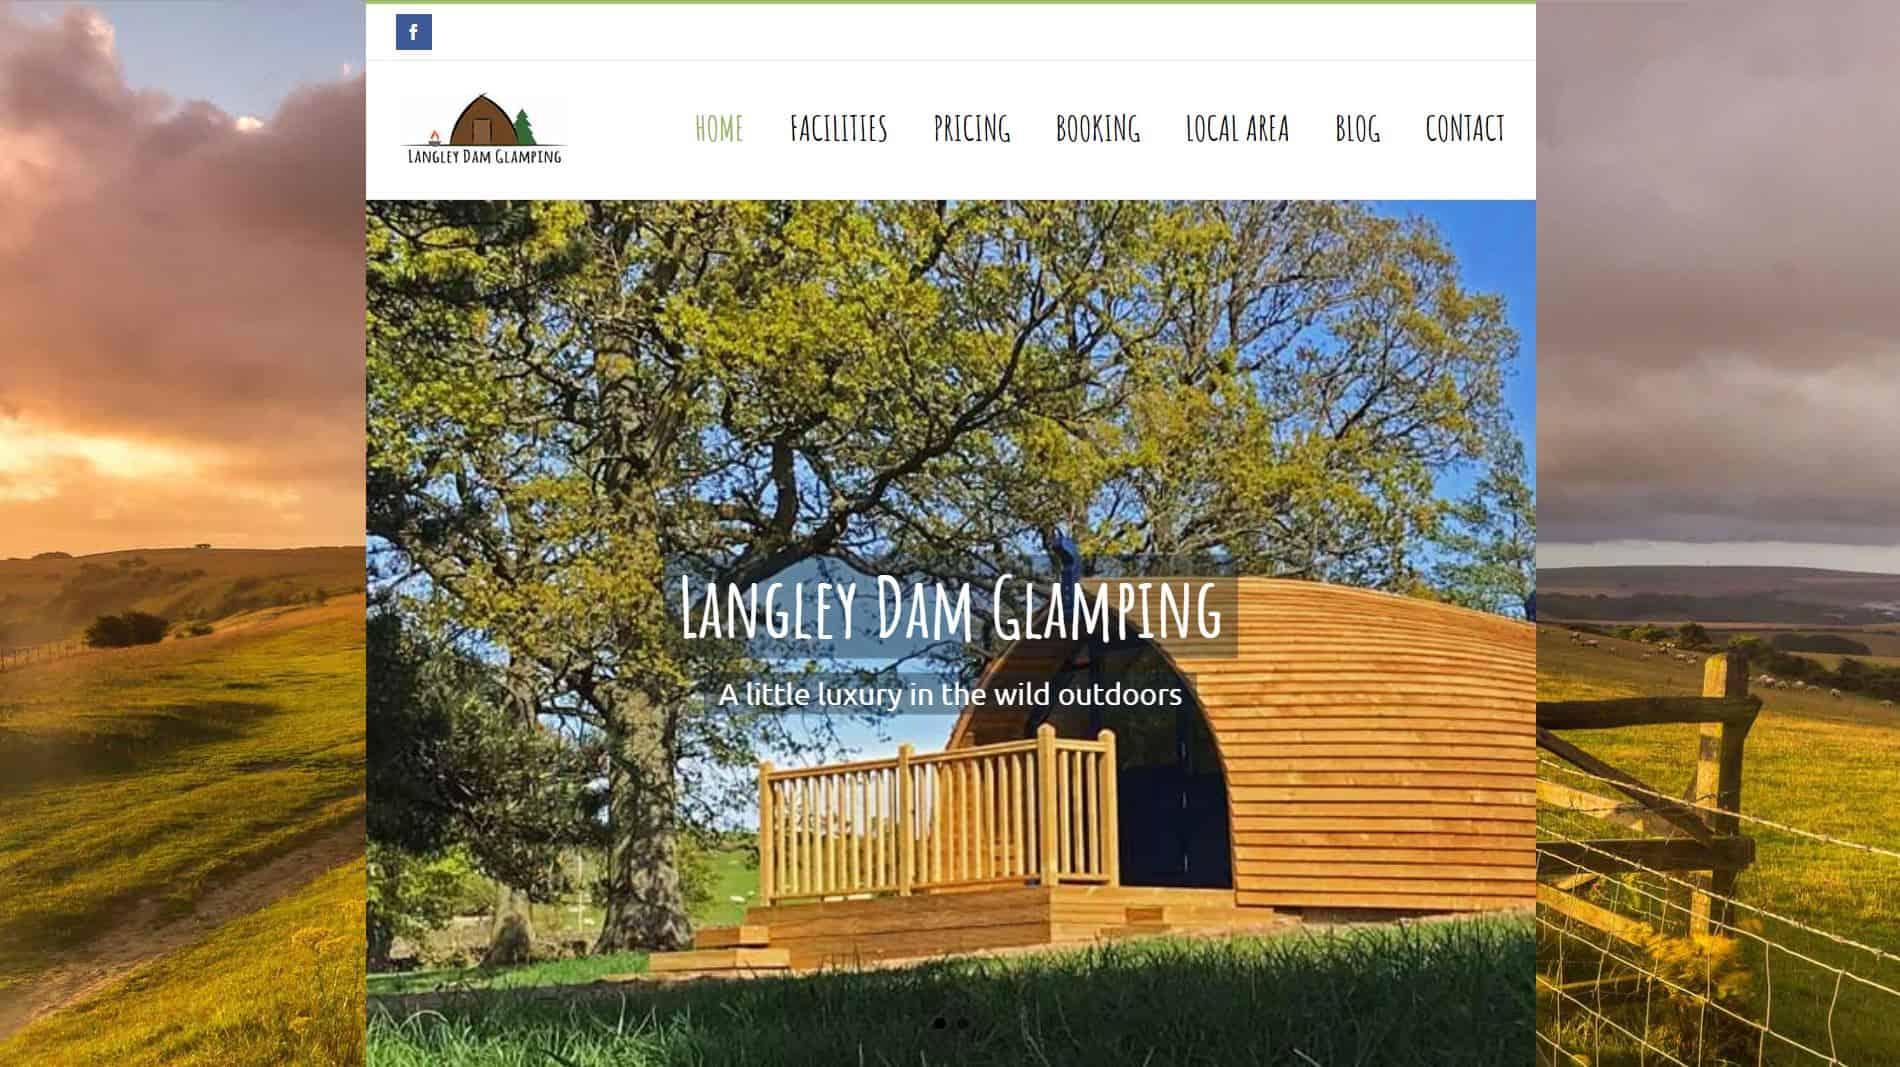 Langley Dam Glamping website